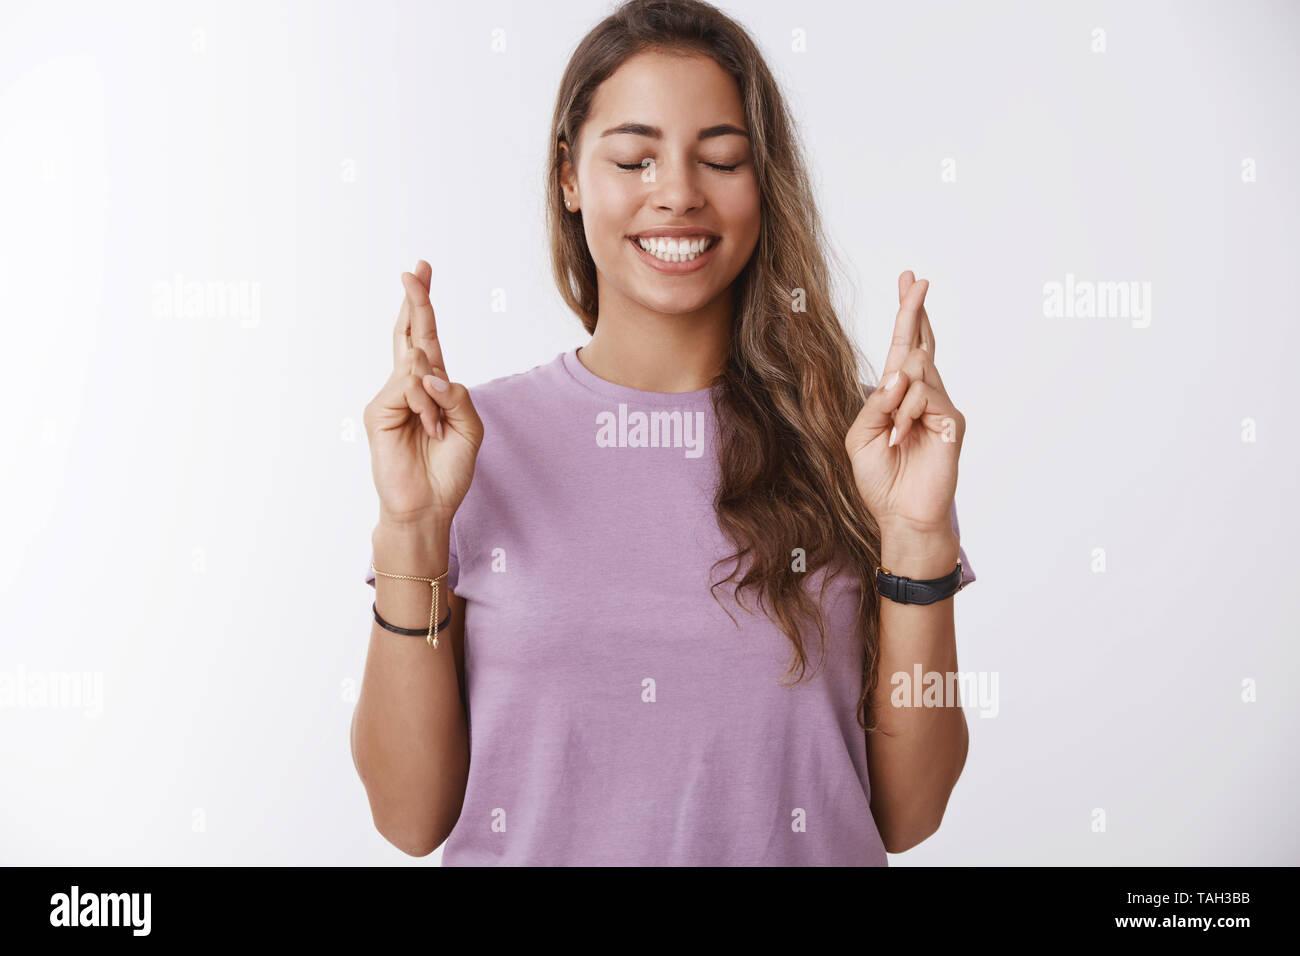 Enthusiastic happy hopeful caucasian girl college student